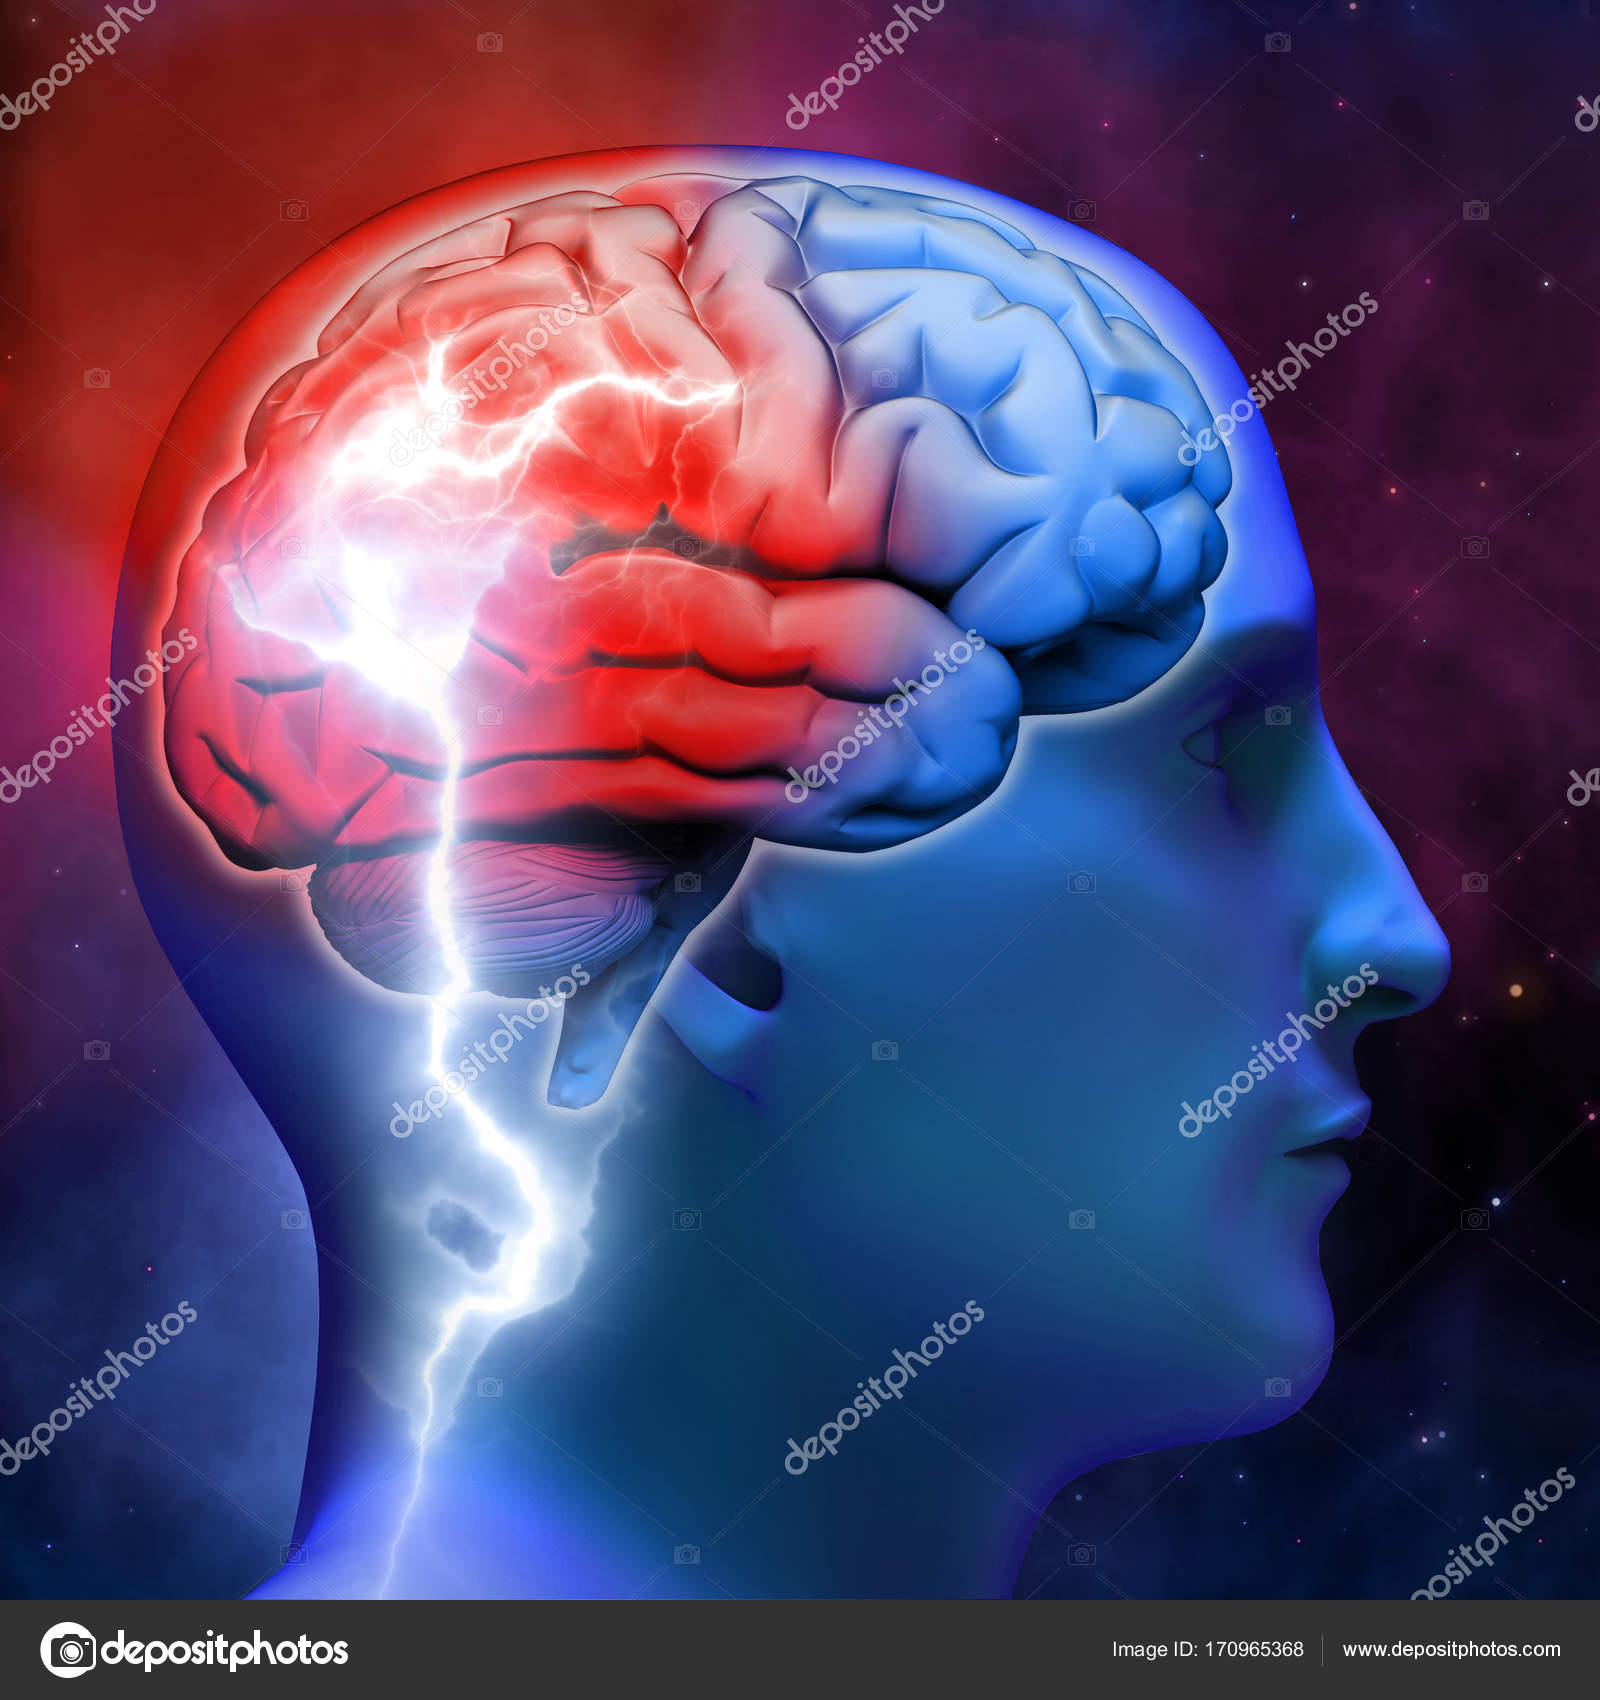 A Bright Flash In The Human Brain Neurology And Disease Nervou